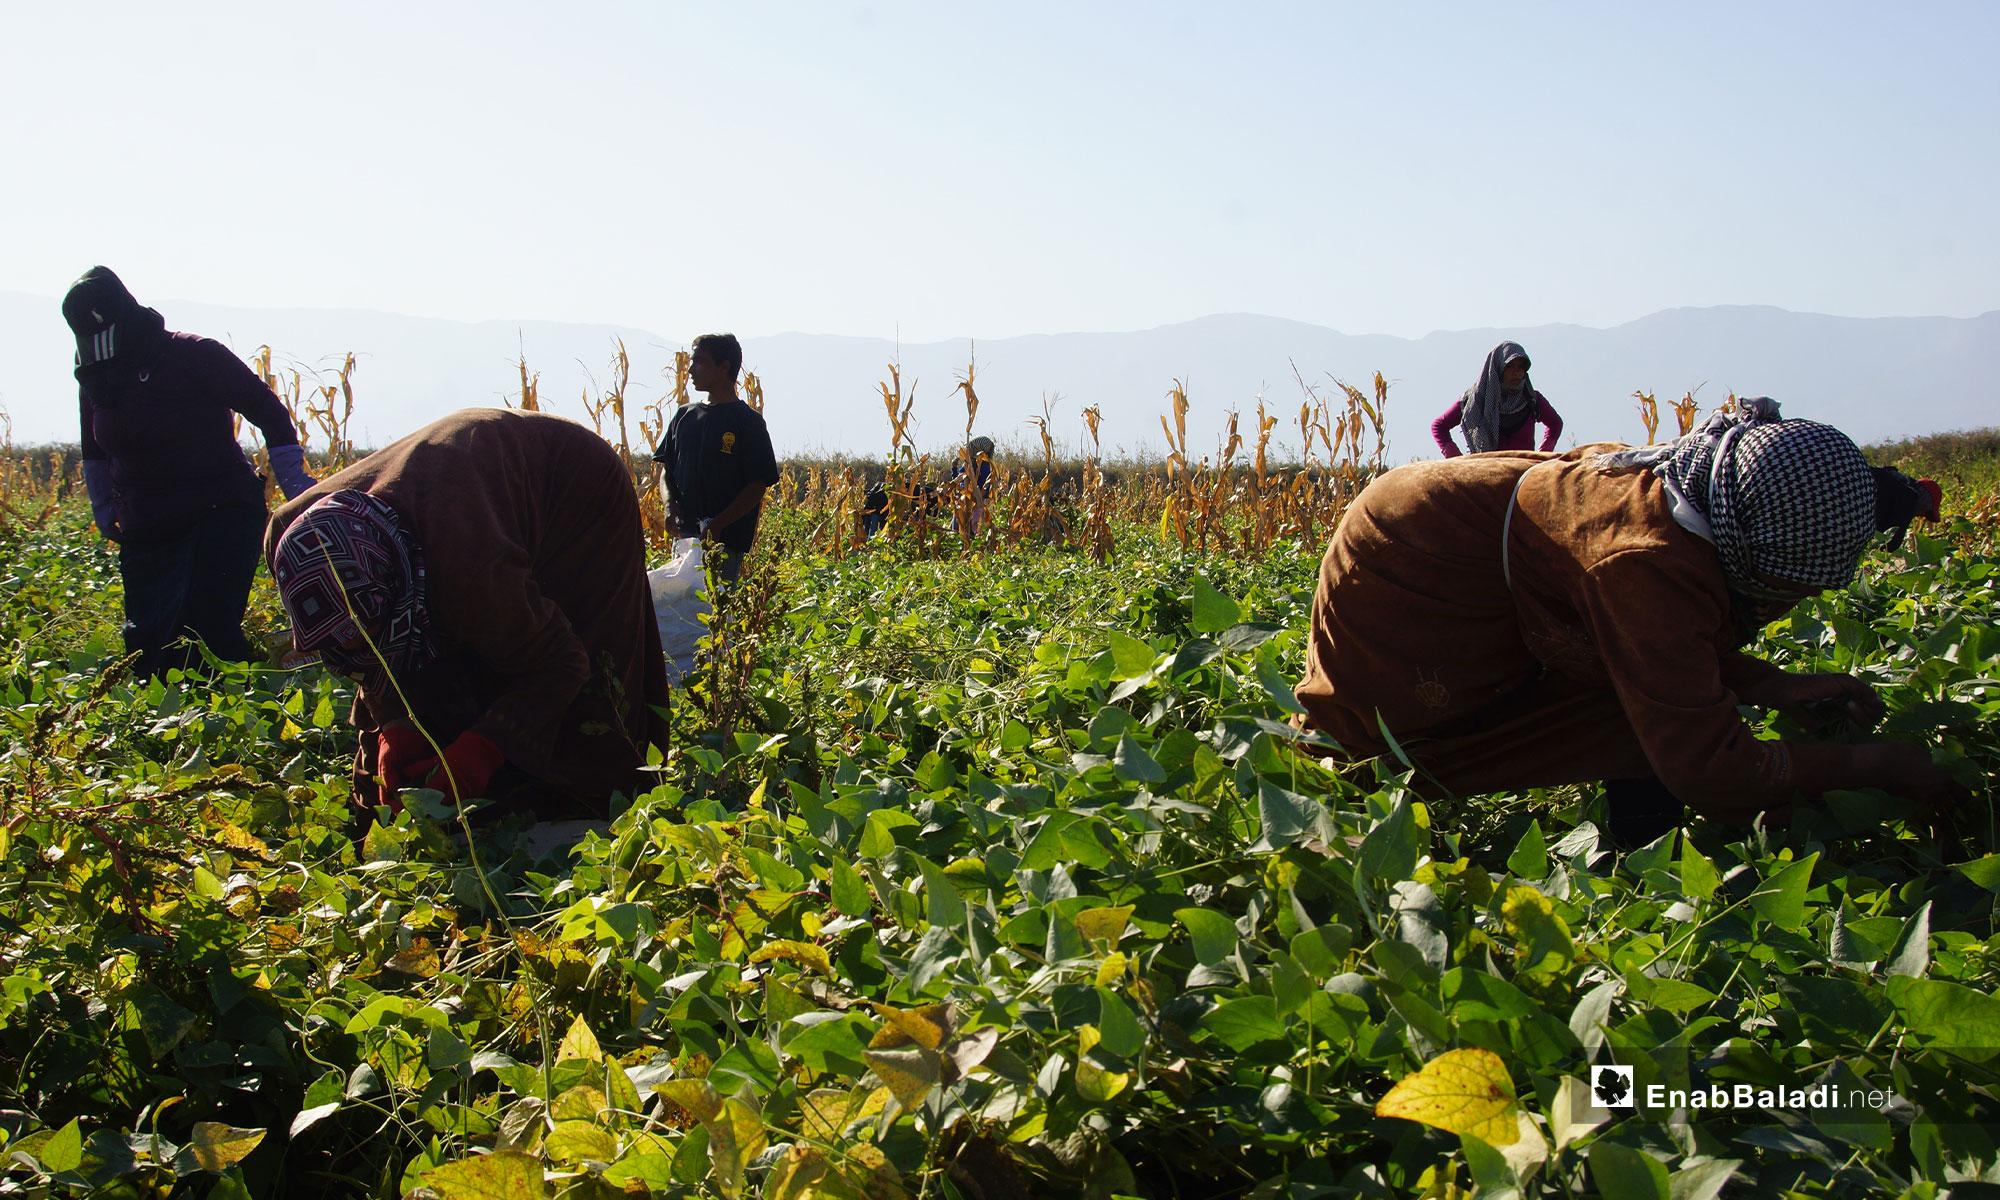 Kidney beans being harvested in the al-Ghab Plain, rural Hama – 31 October 2018 (Enab Baladi)